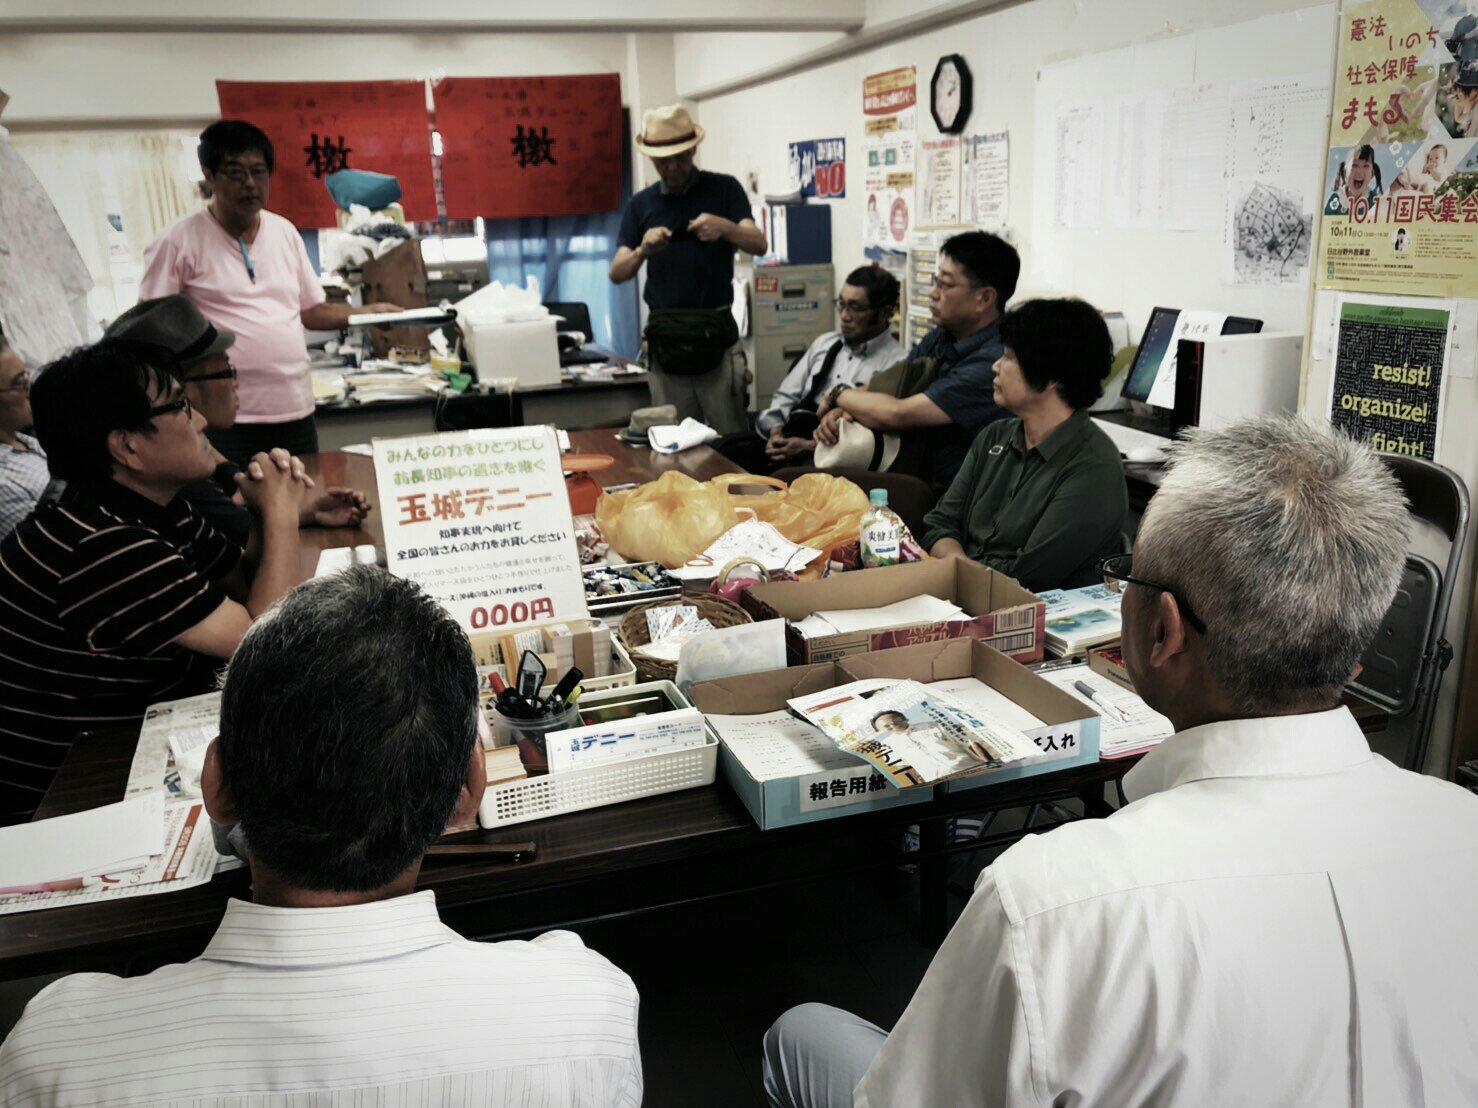 沖縄県知事選挙への支援行動